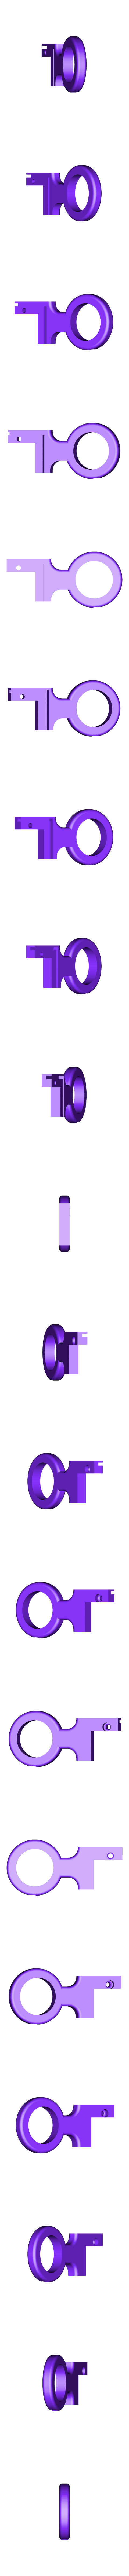 tringle-droite.stl Download free STL file Bar rod • Template to 3D print, david39